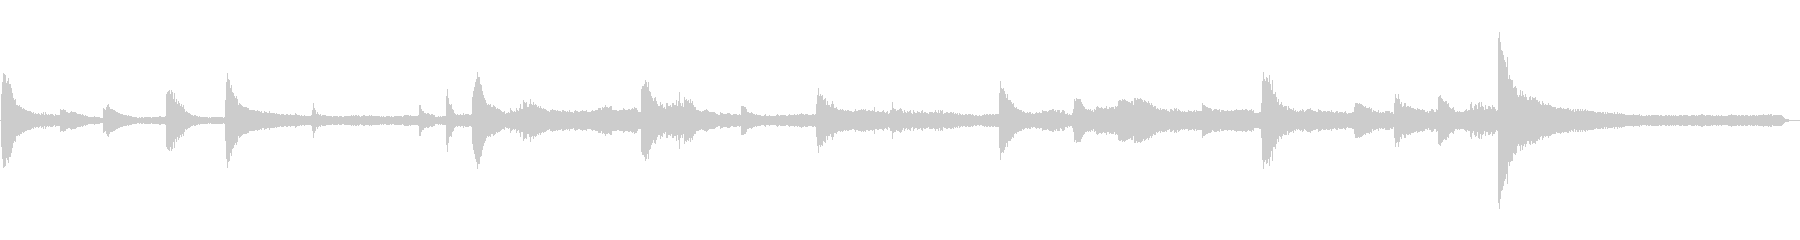 Frightening Japanese horror music's unreproduced waveform